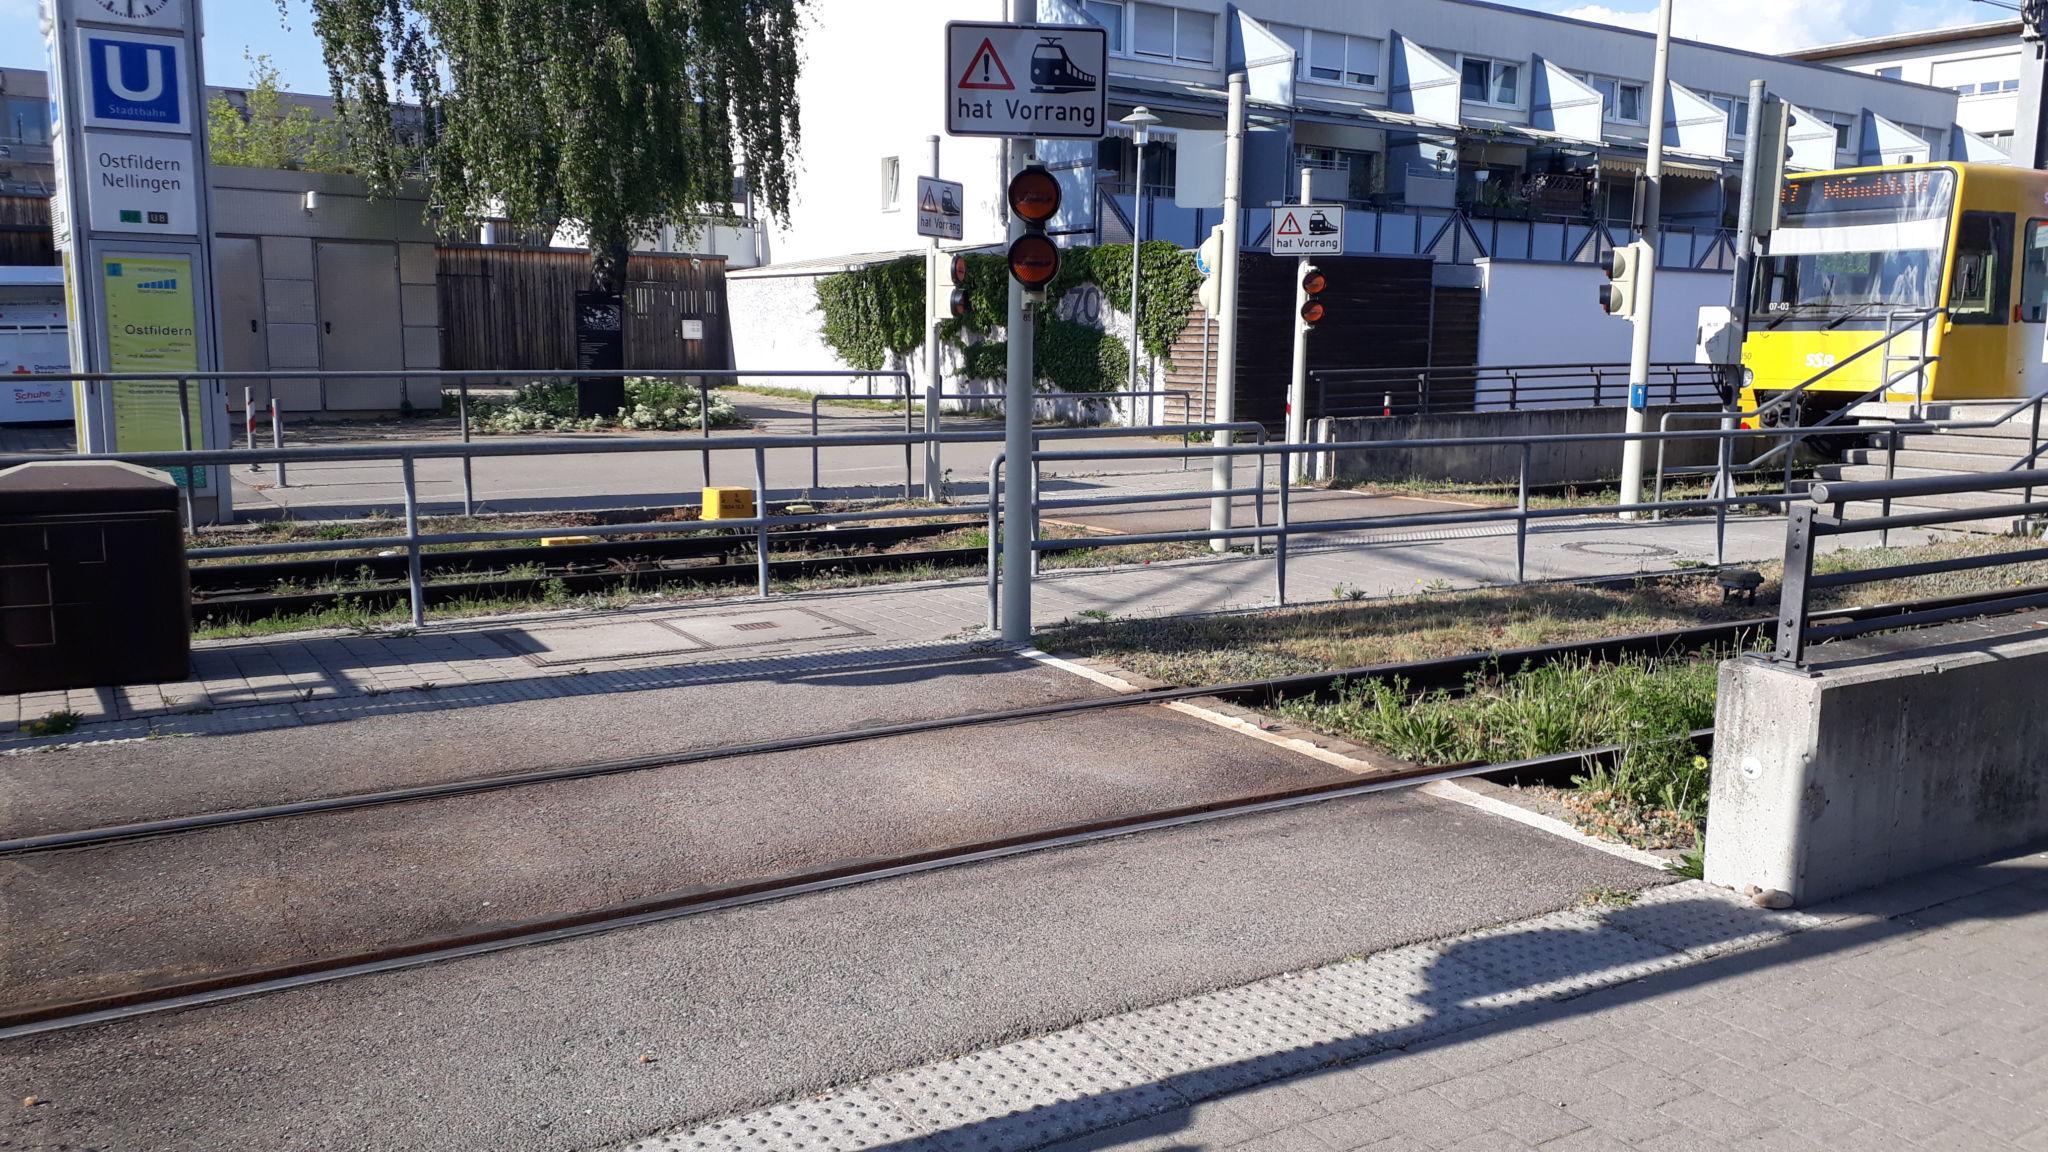 Stadtbahnhaltestelle Nellingen U7 / U8, Nellingen